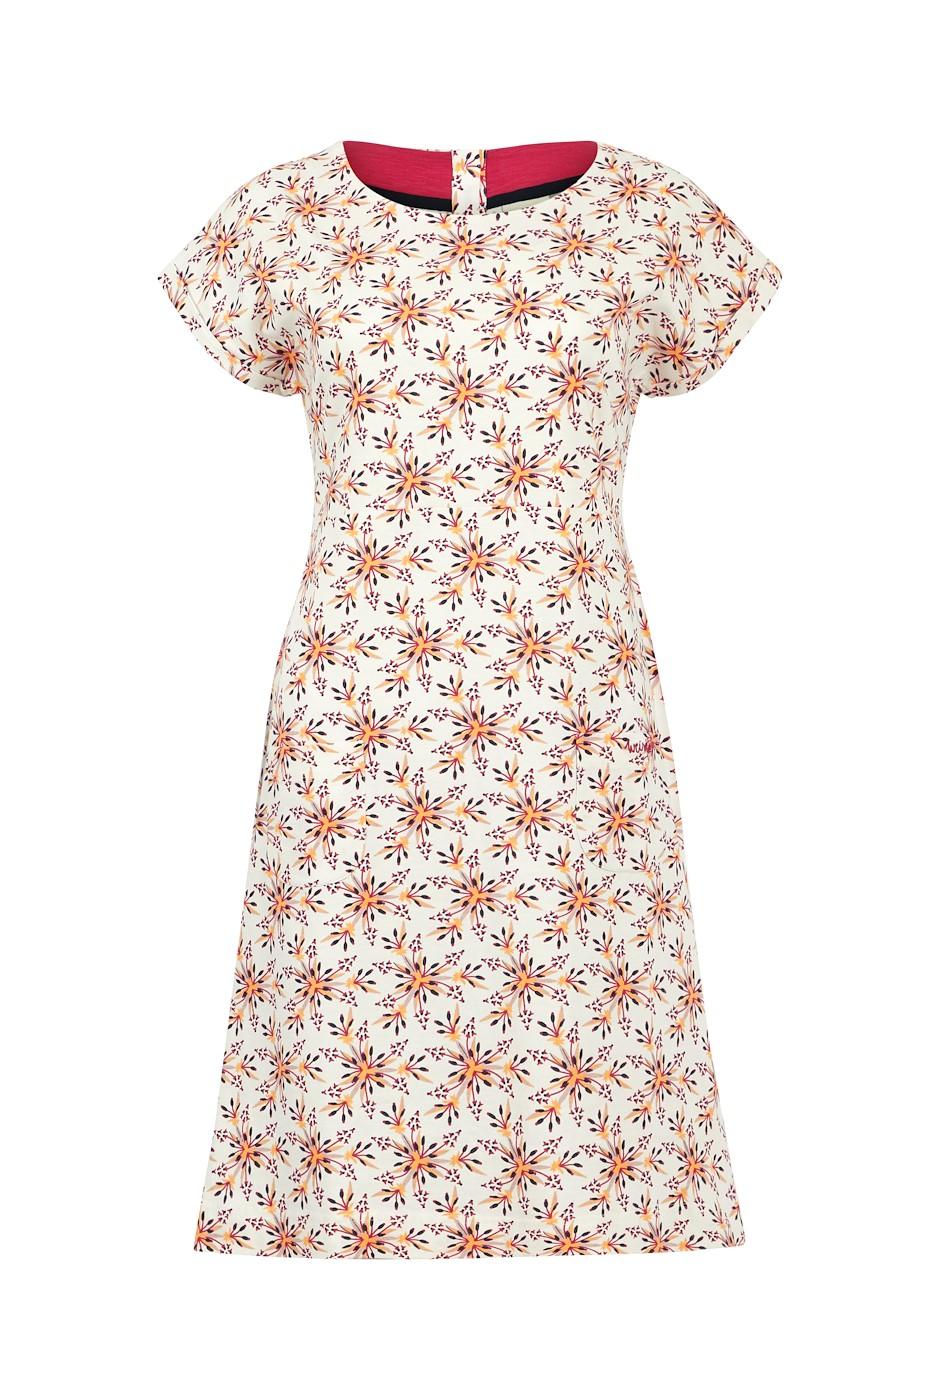 Tallahassee Organic Cotton Printed Jersey Dress Light Cream